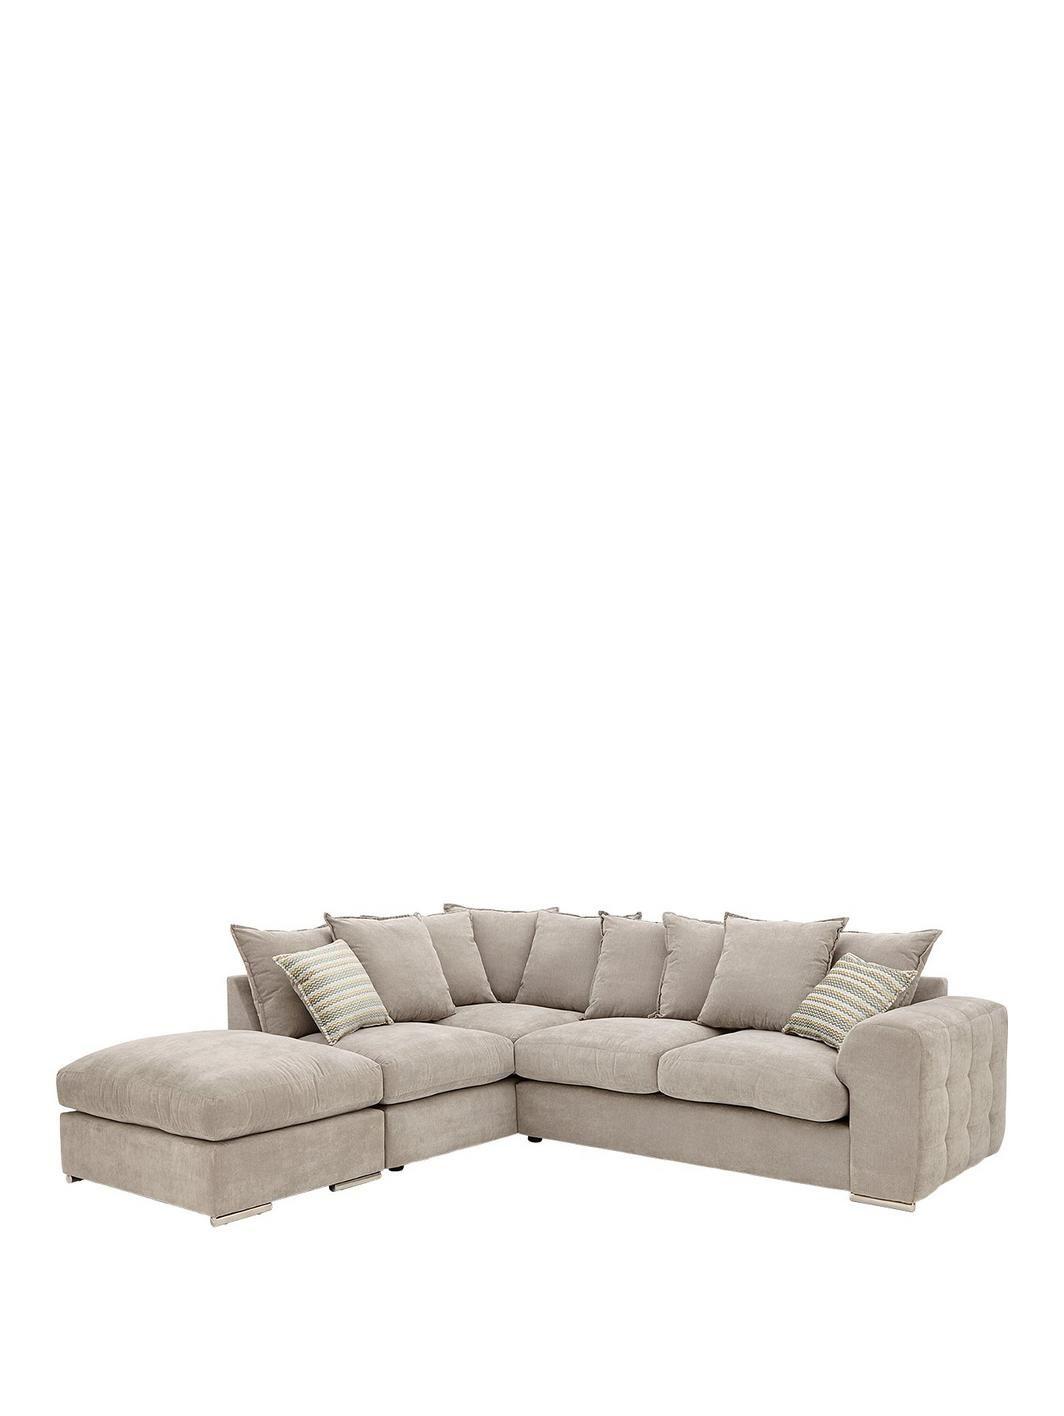 Cavendish Sophia Left Hand Corner Chaise Sofa With Footstool Chaise Sofa Fabric Sofa Grey Corner Sofa